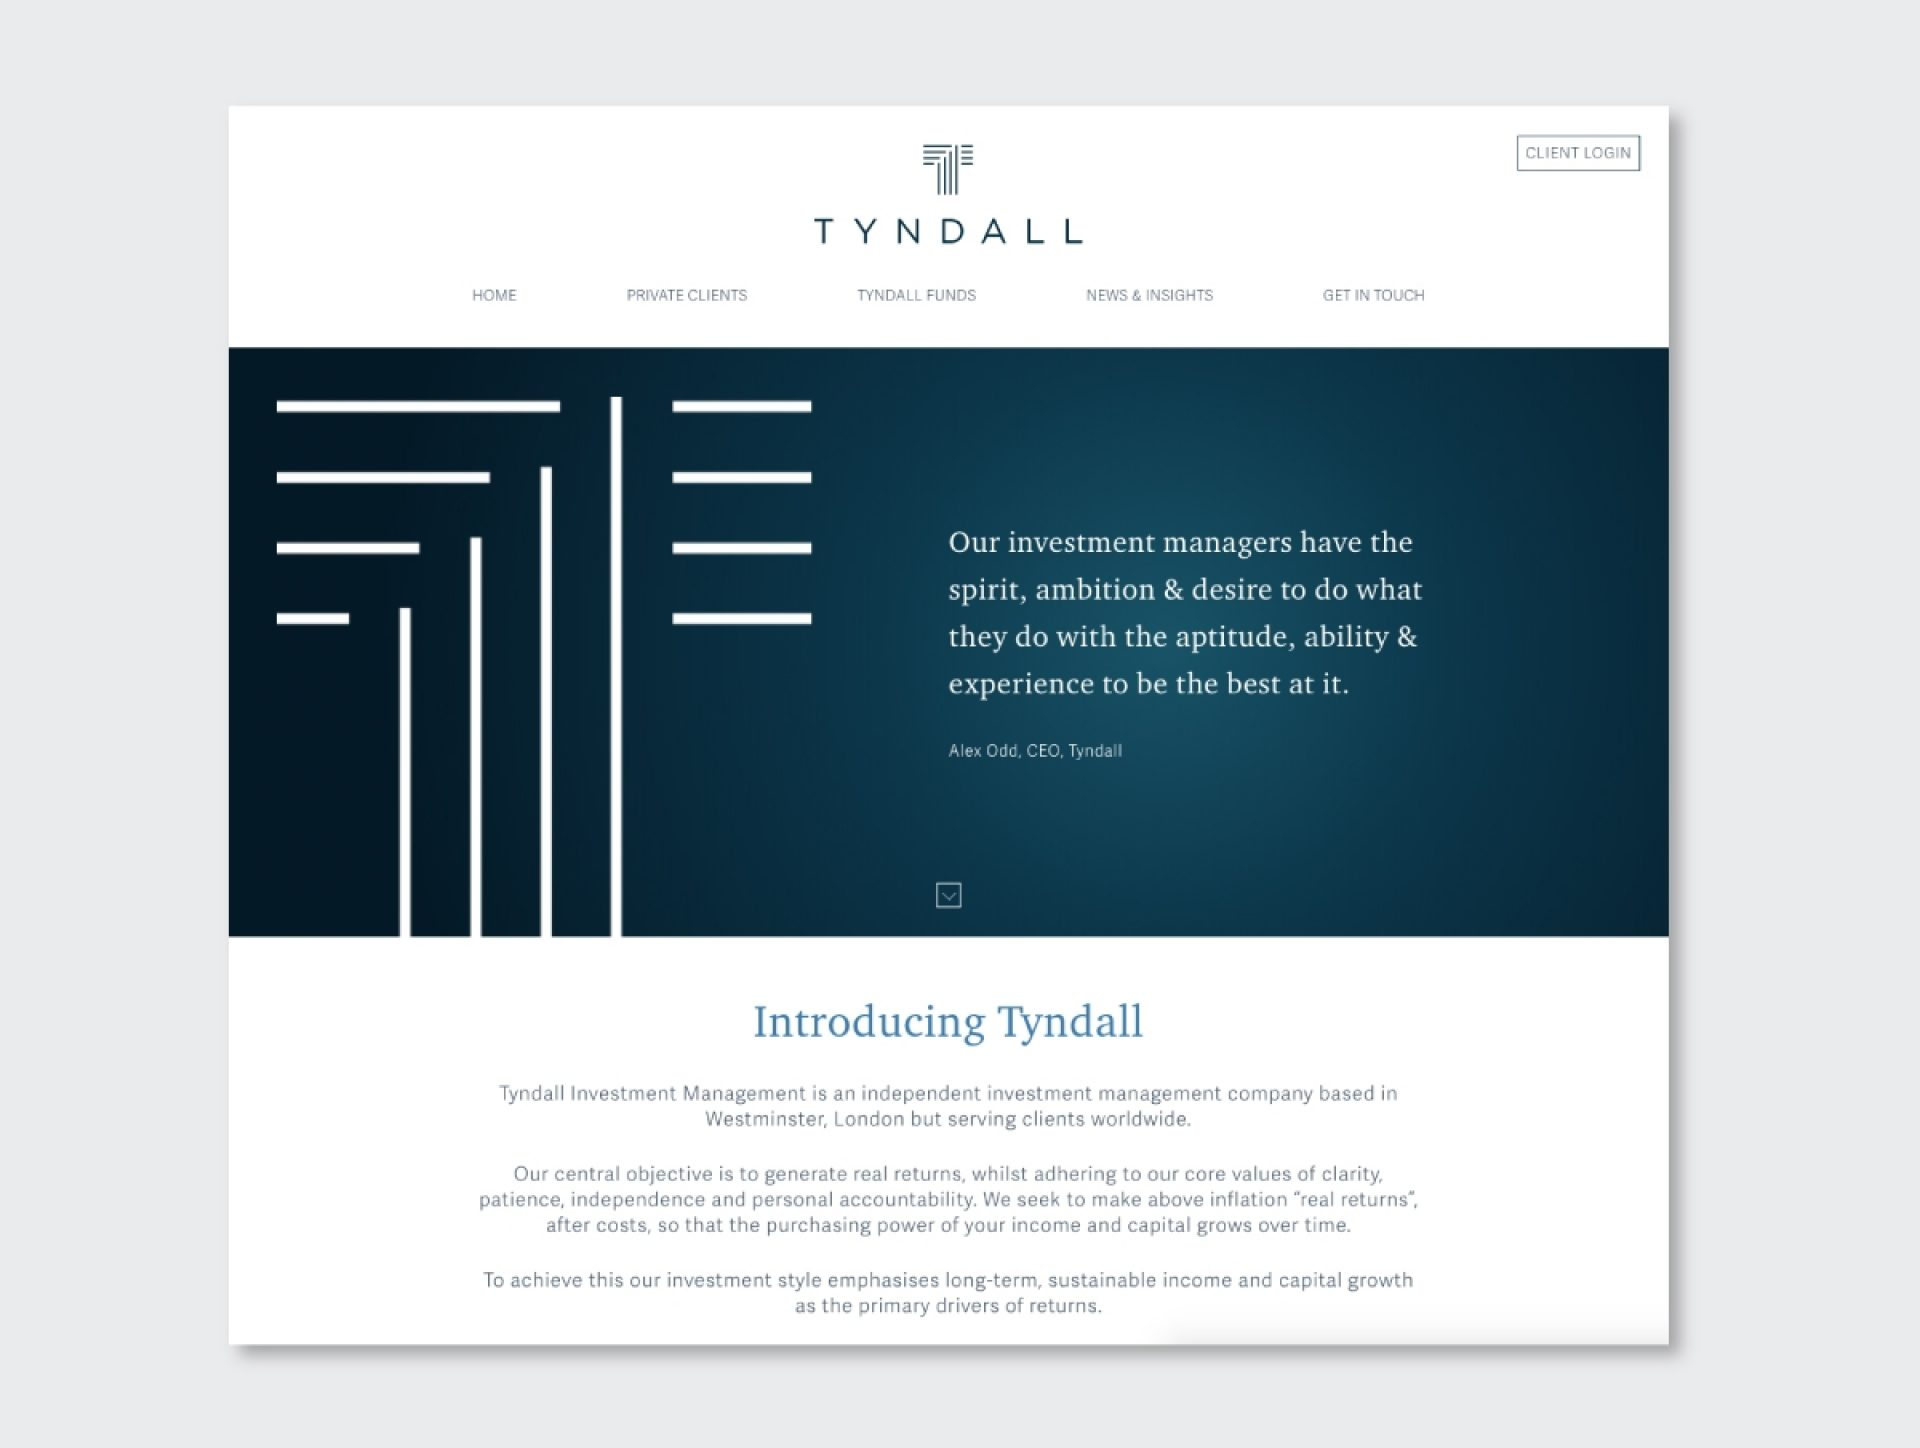 Tyndall 1 07